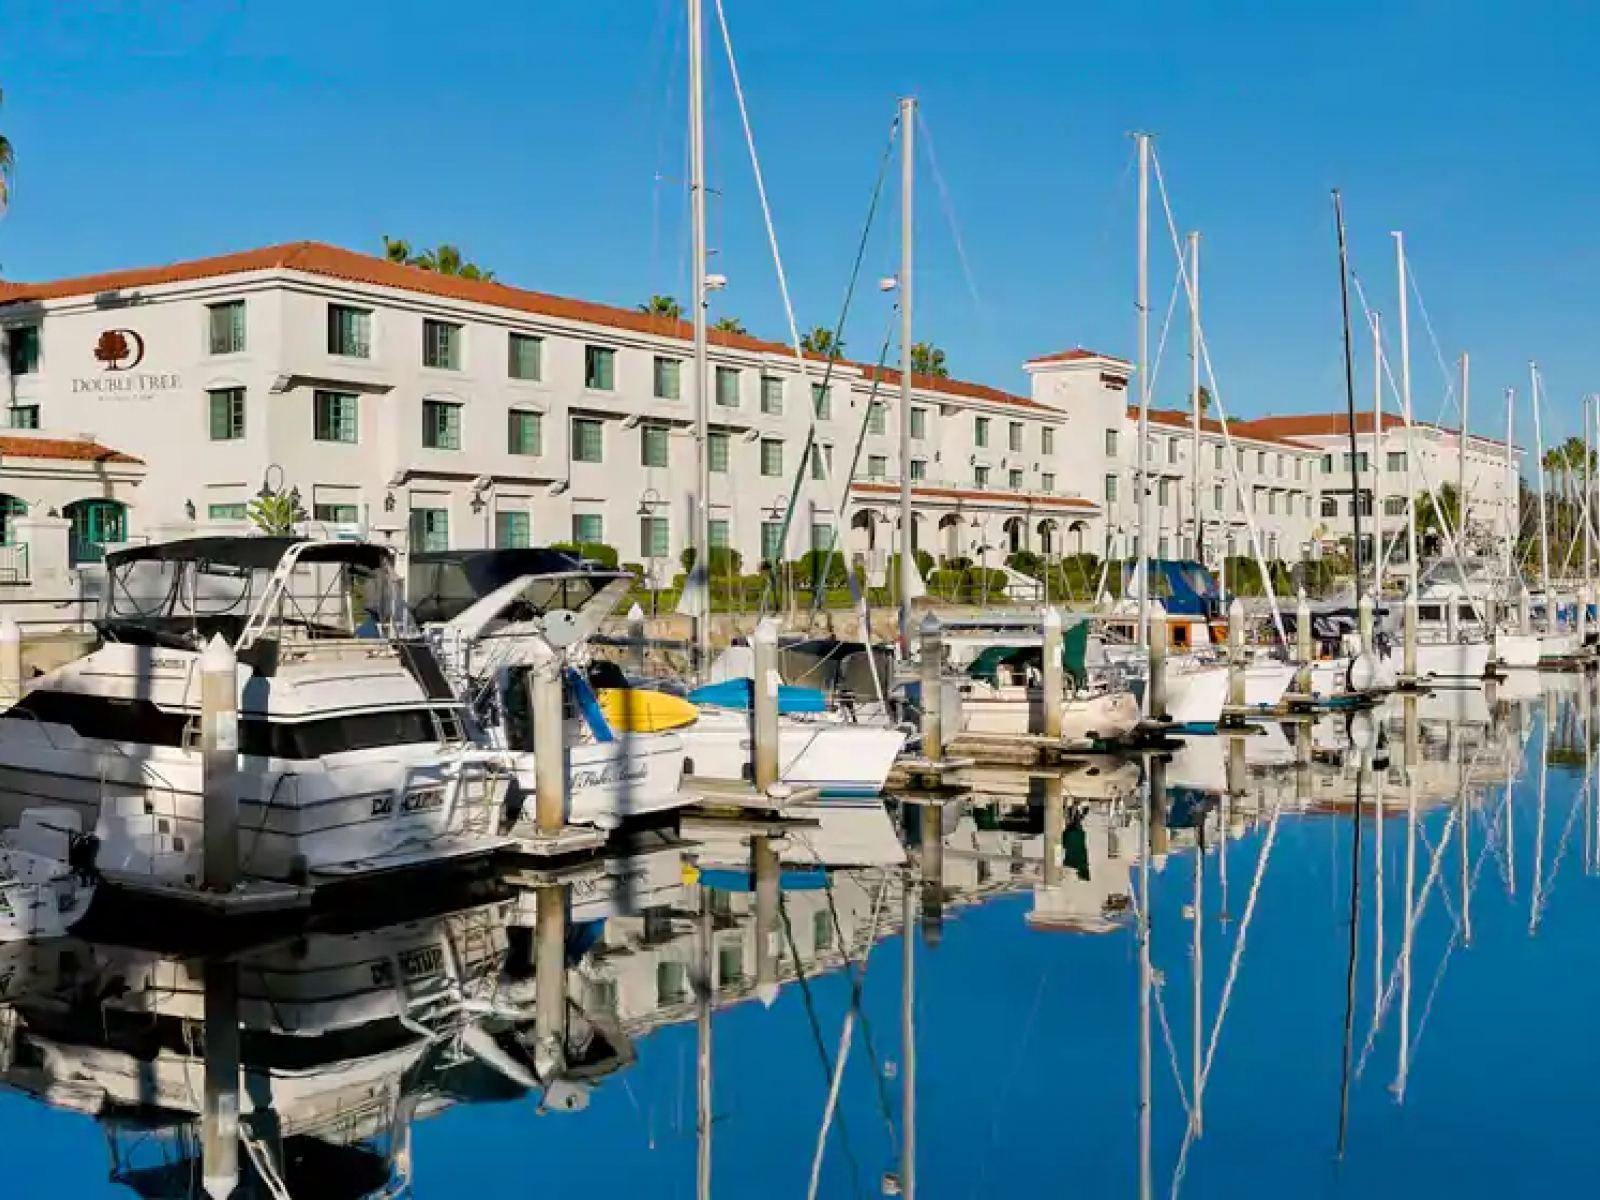 DoubleTree by Hilton San Pedro boats